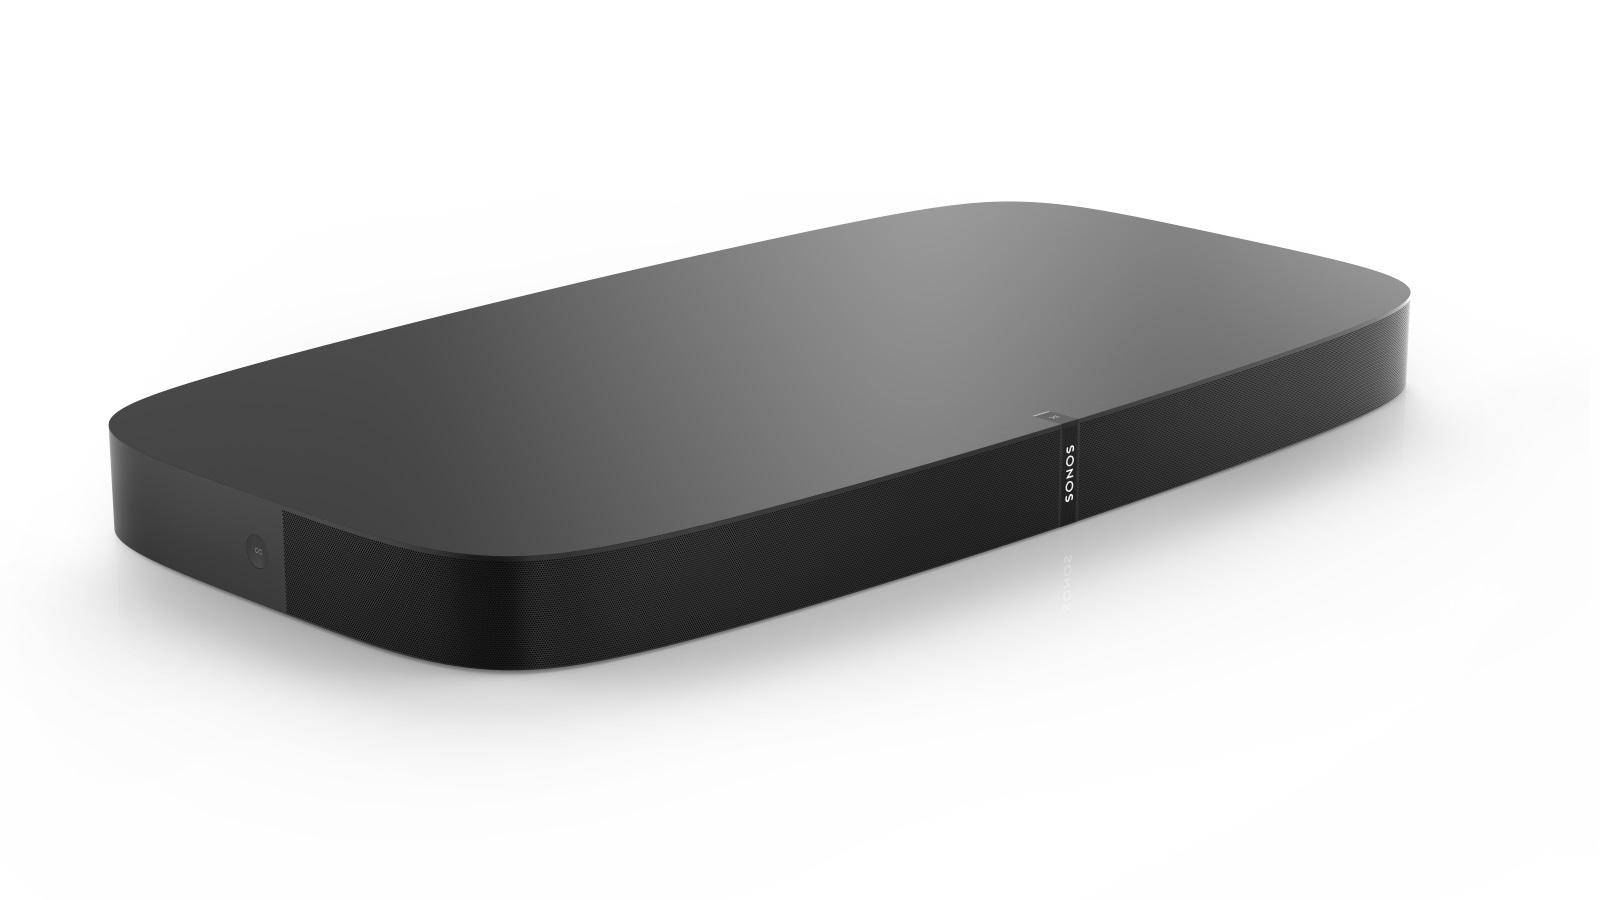 59b2bb12c58 Buy Sonos PLAYBASE Wireless Soundbase for TVs and Music - Black ...